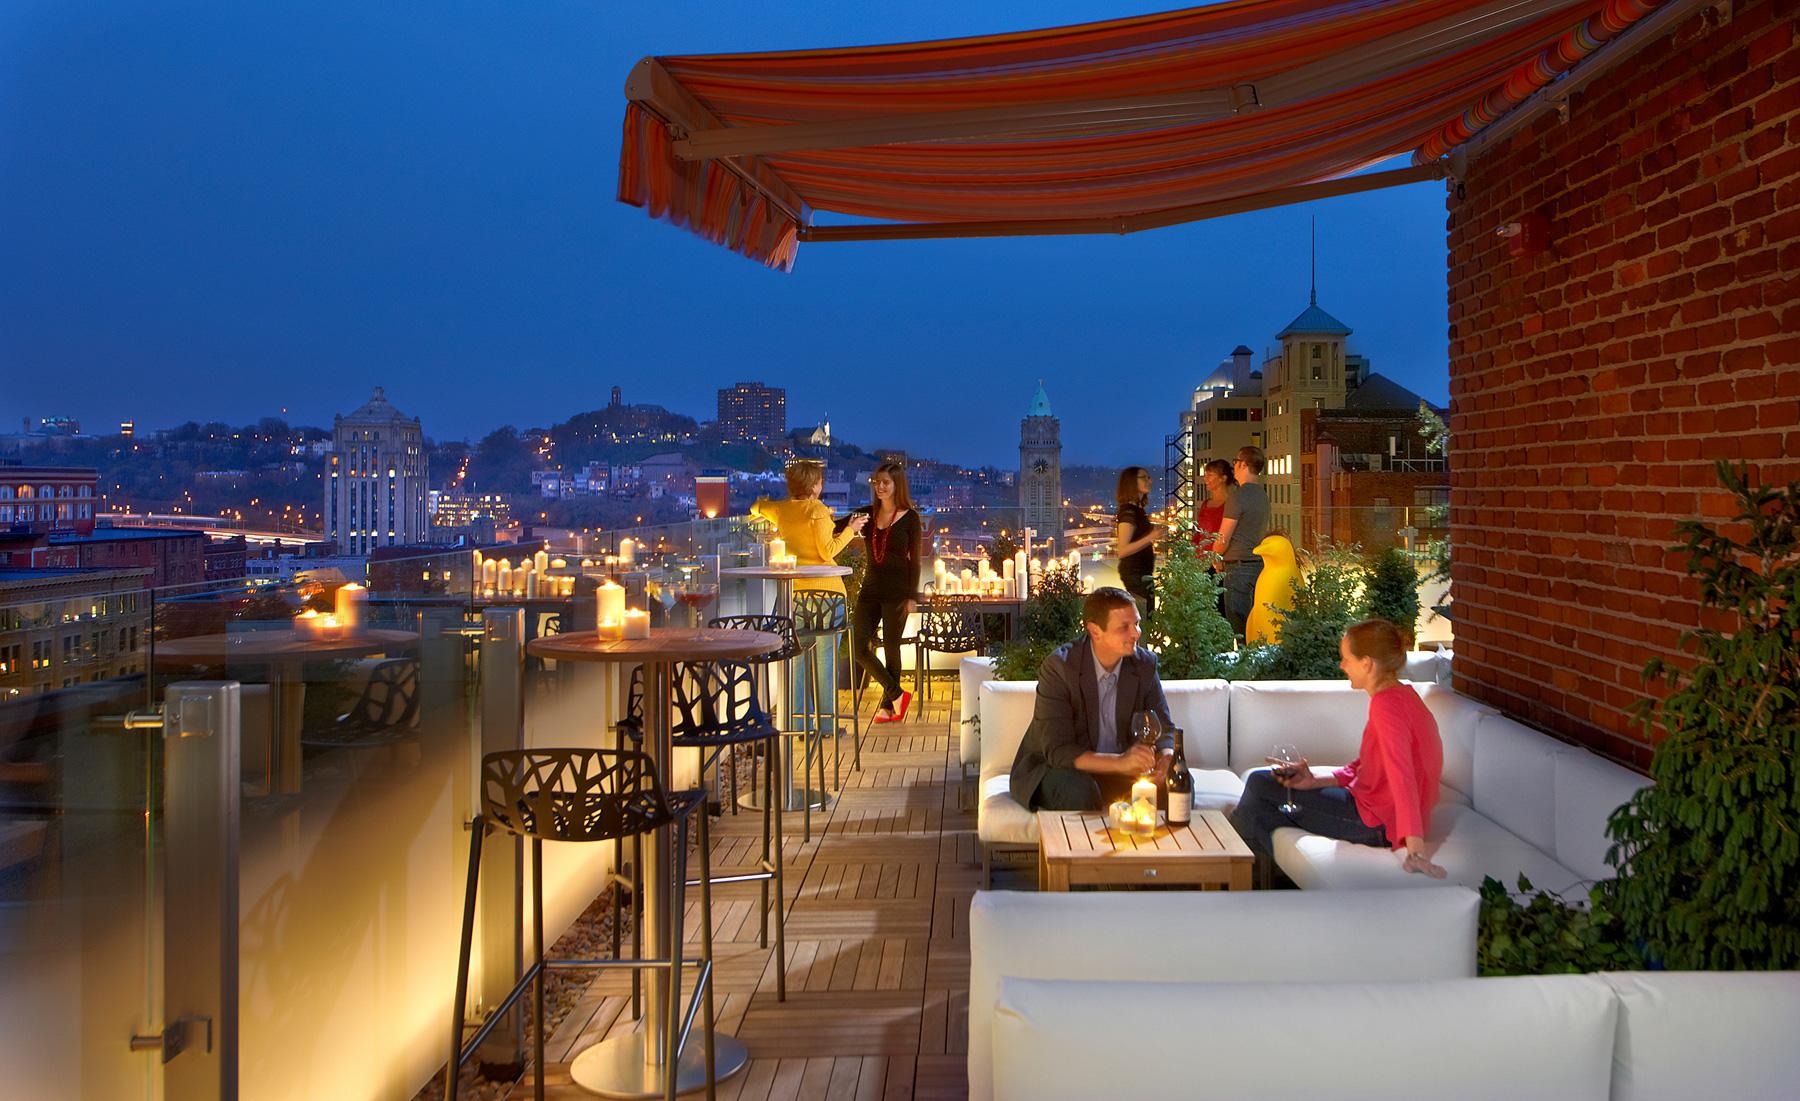 Rooftop bar, 21c Museum Hotel